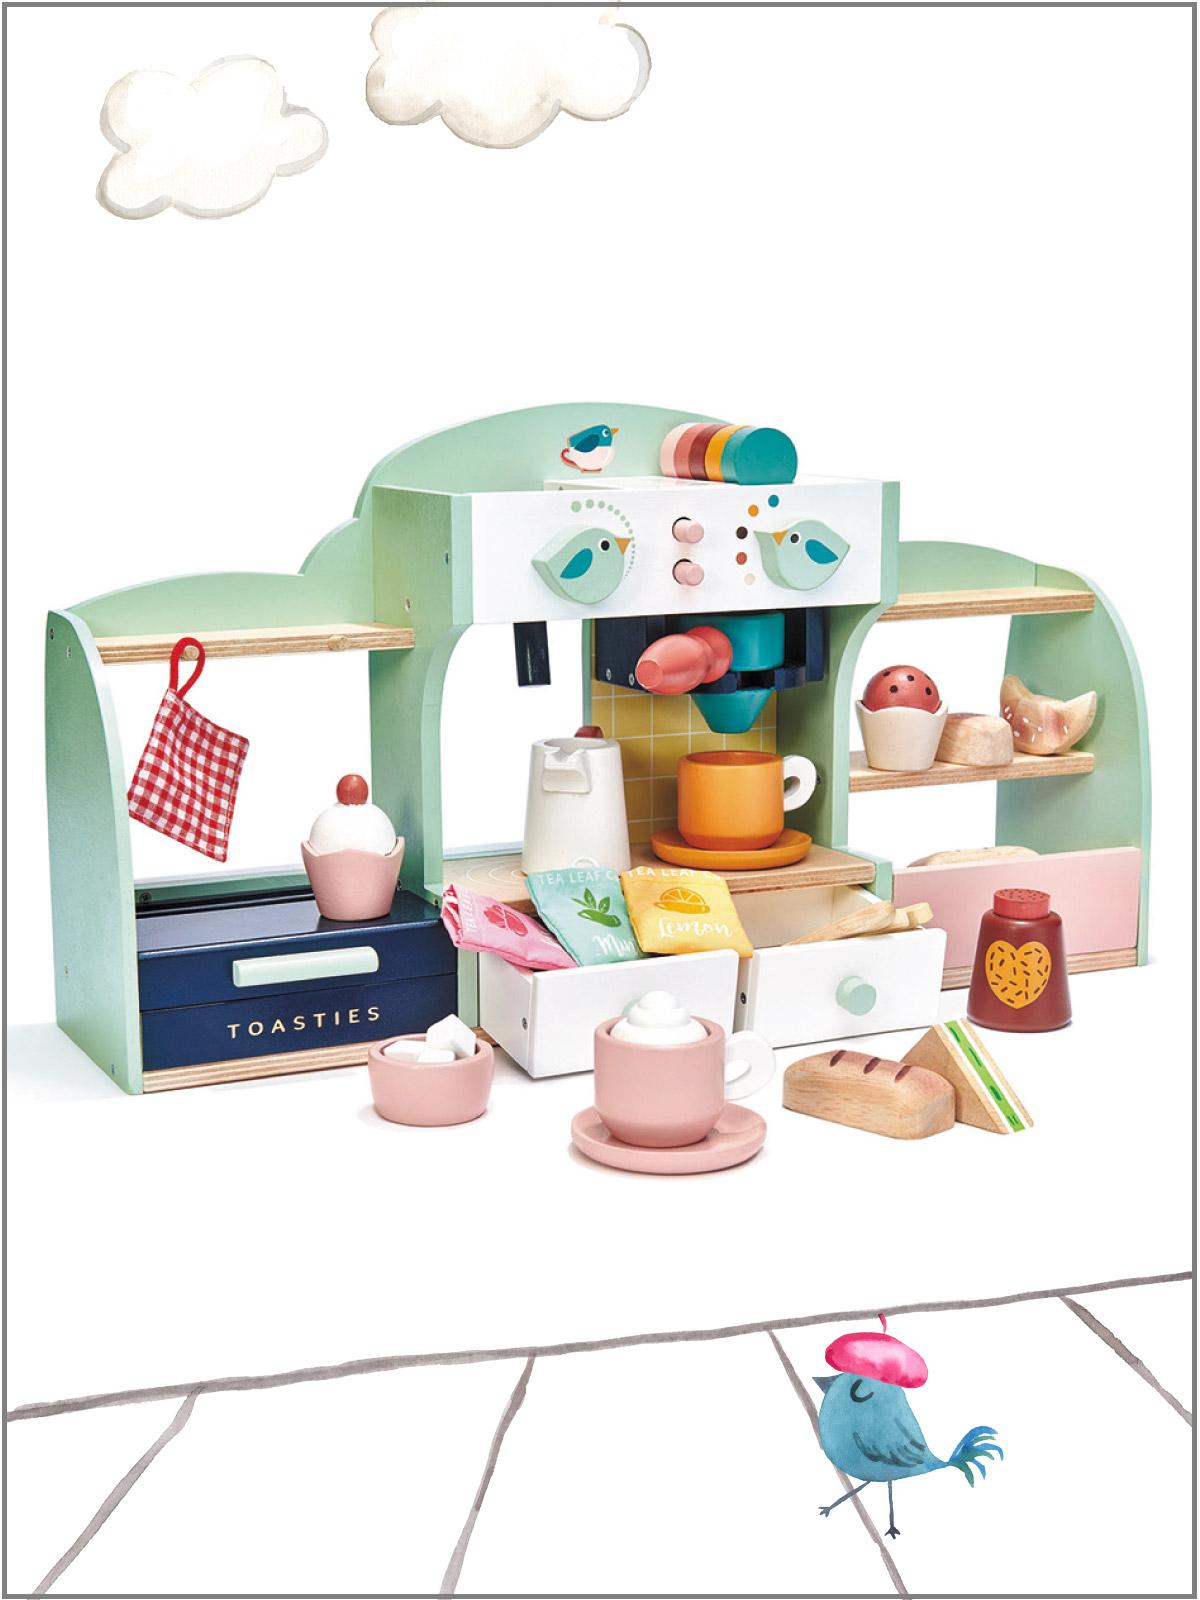 frederickandsophie-kids-toys-tender_leaf-birds_nest_cafe-barista-pretend-play-kidpreneur